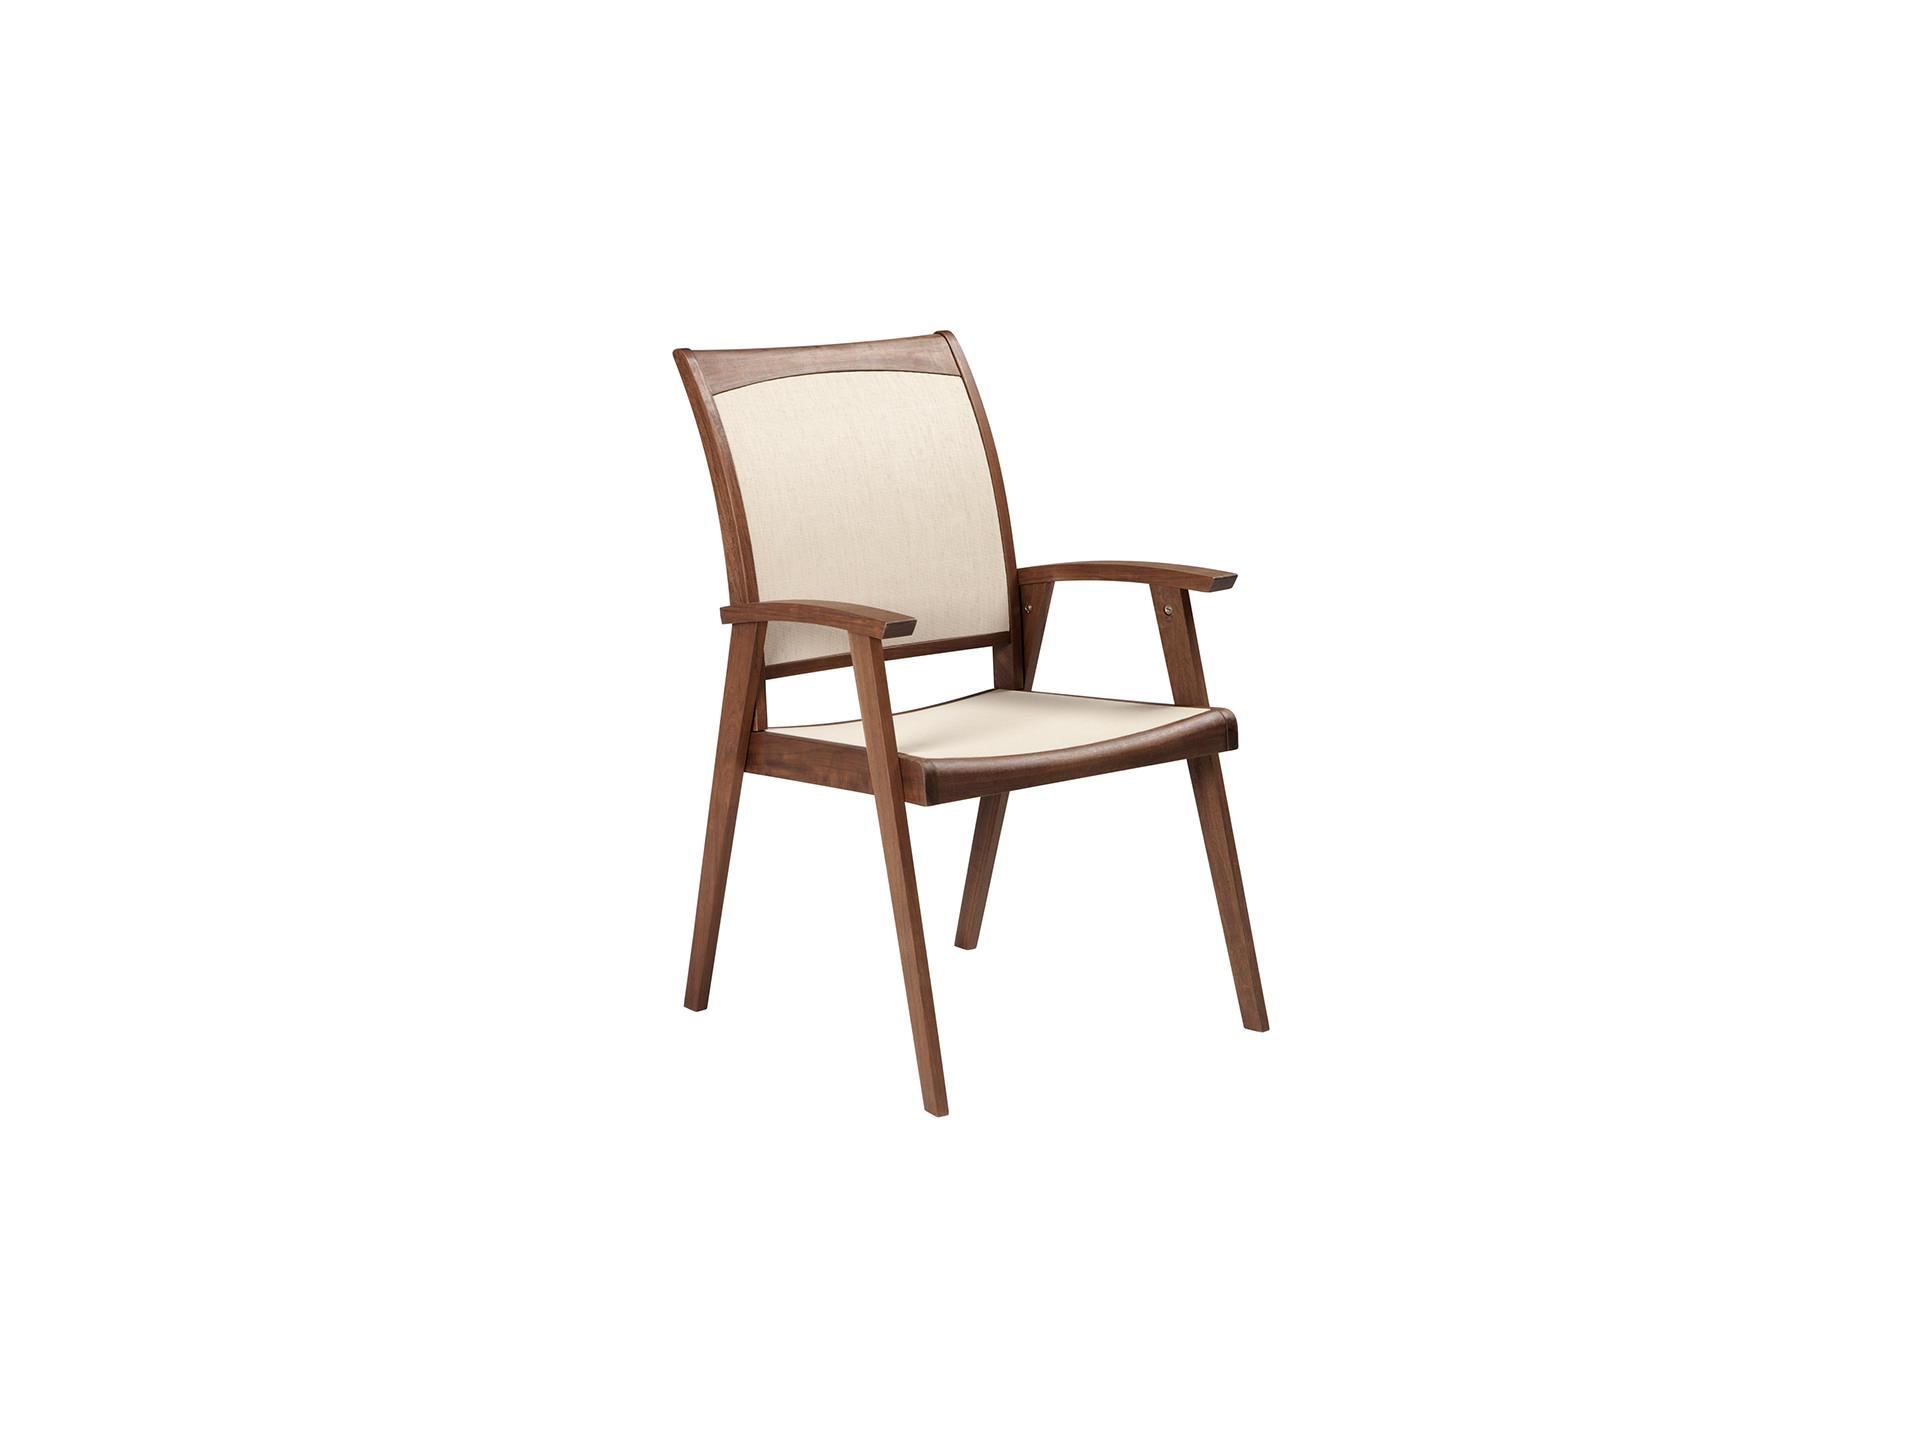 Sling Chaise Lounge Amazon: Jensen Leisure: Topaz Collection